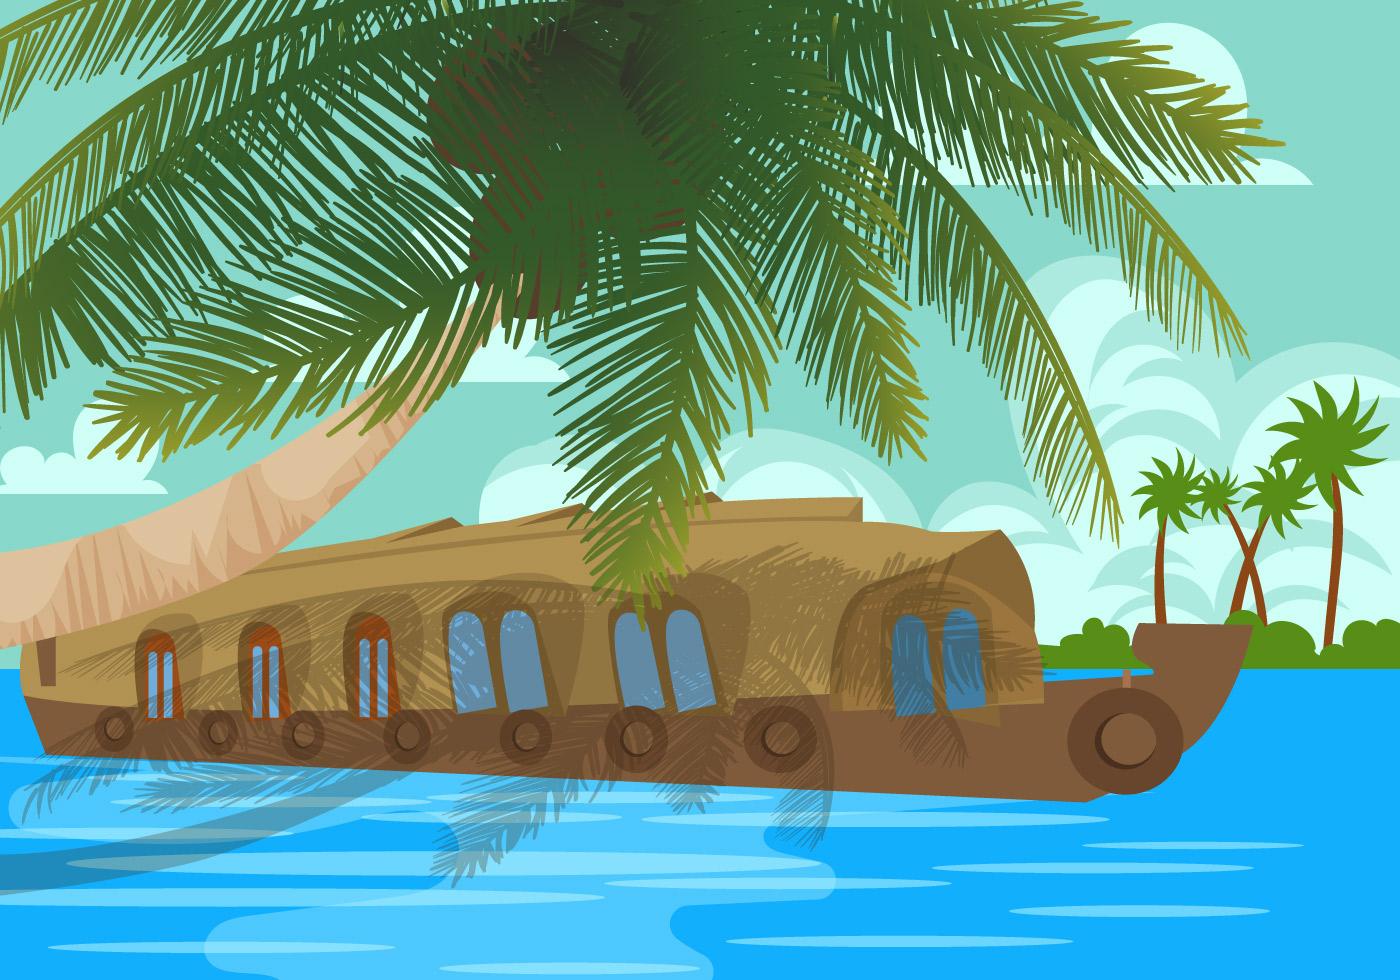 Kerala Backwaters Houseboat Vector - Download Free Vector Art Stock Graphics U0026 Images